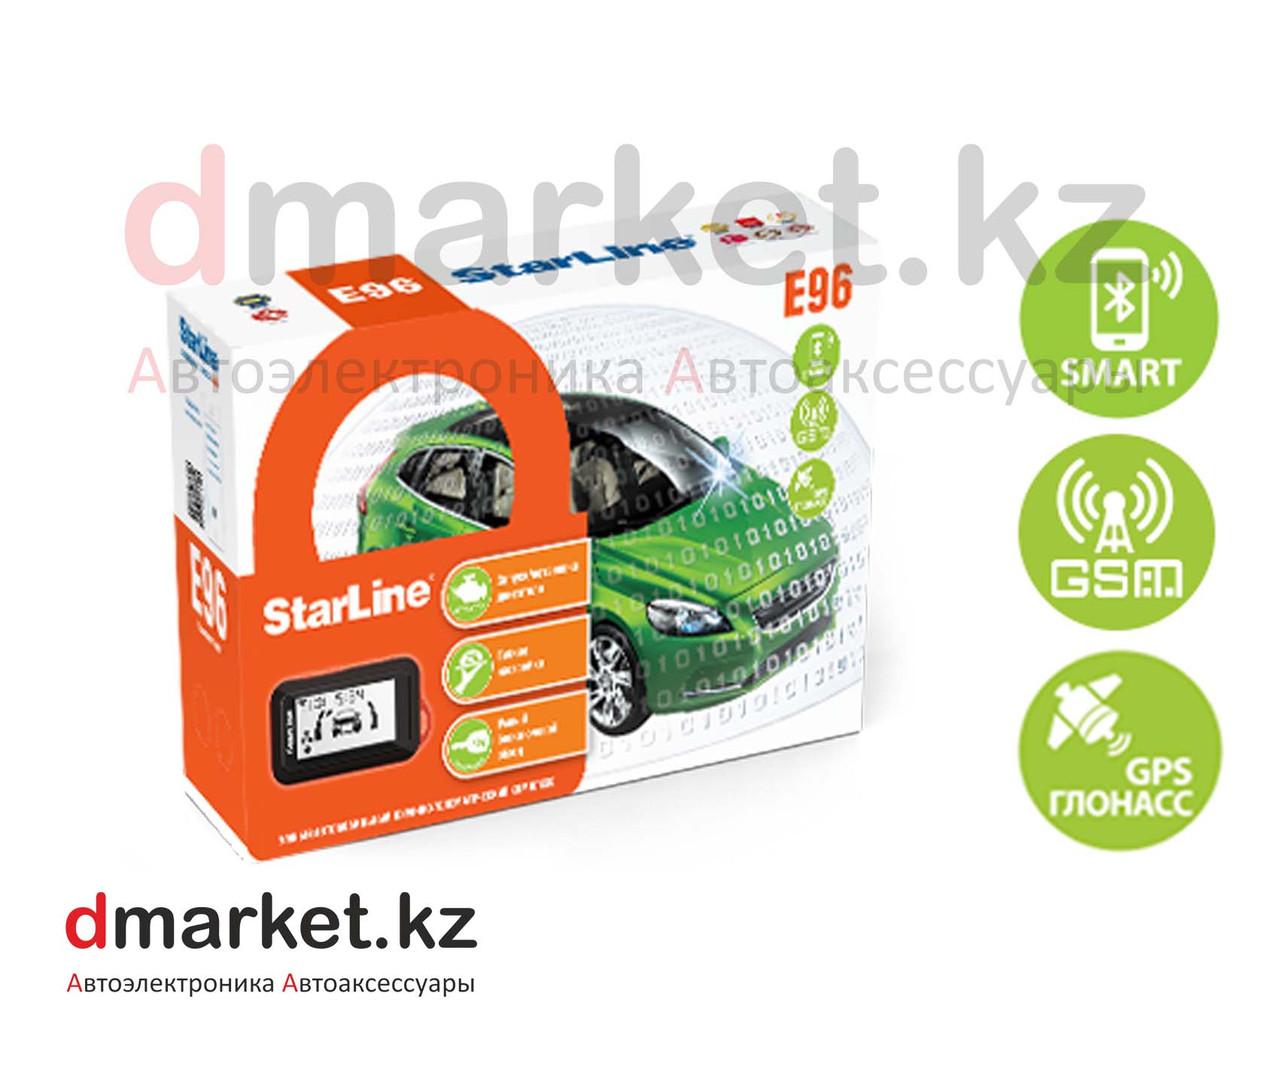 StarLine E96 BT GSM GPS, 2CAN-2LIN, Bluetooth, GSM+GPS, брелок-метка, автозавод, авторизация через телефон